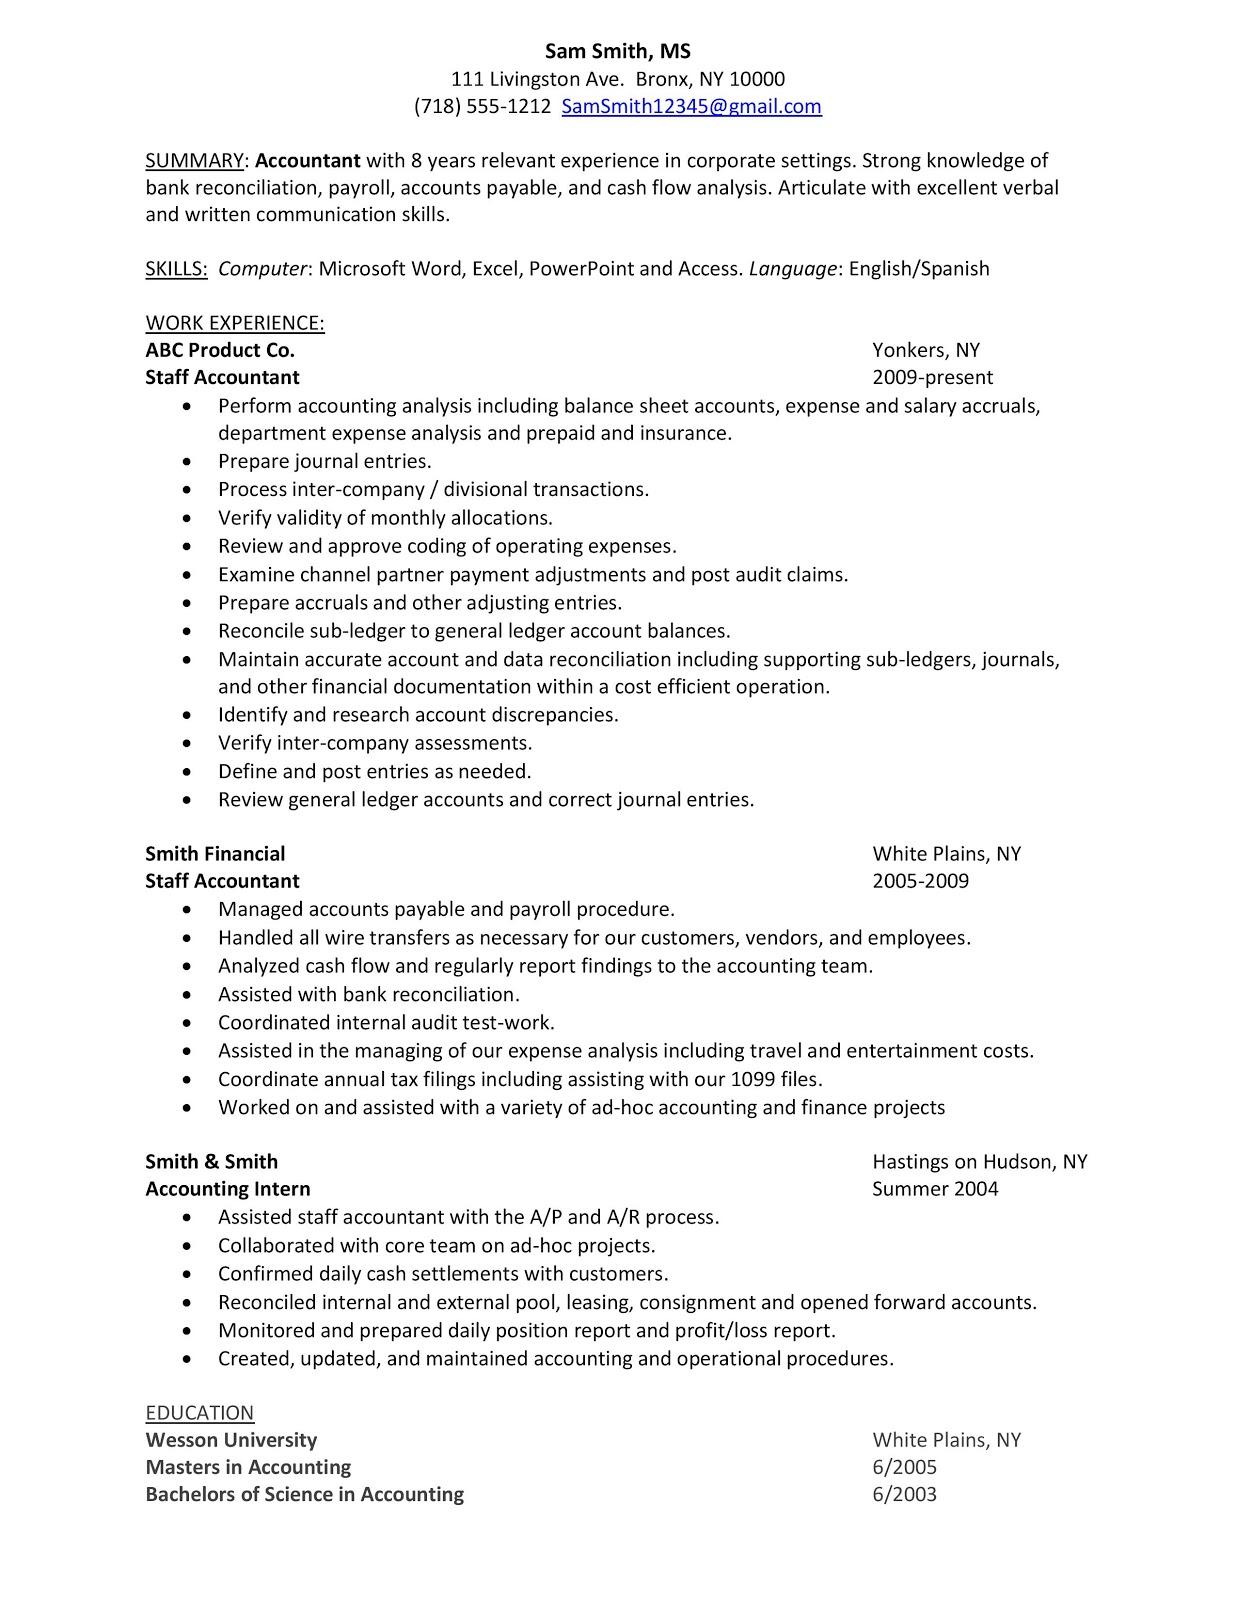 Bank Internal Auditor Cover Letter | Sample Career Change Cover ...